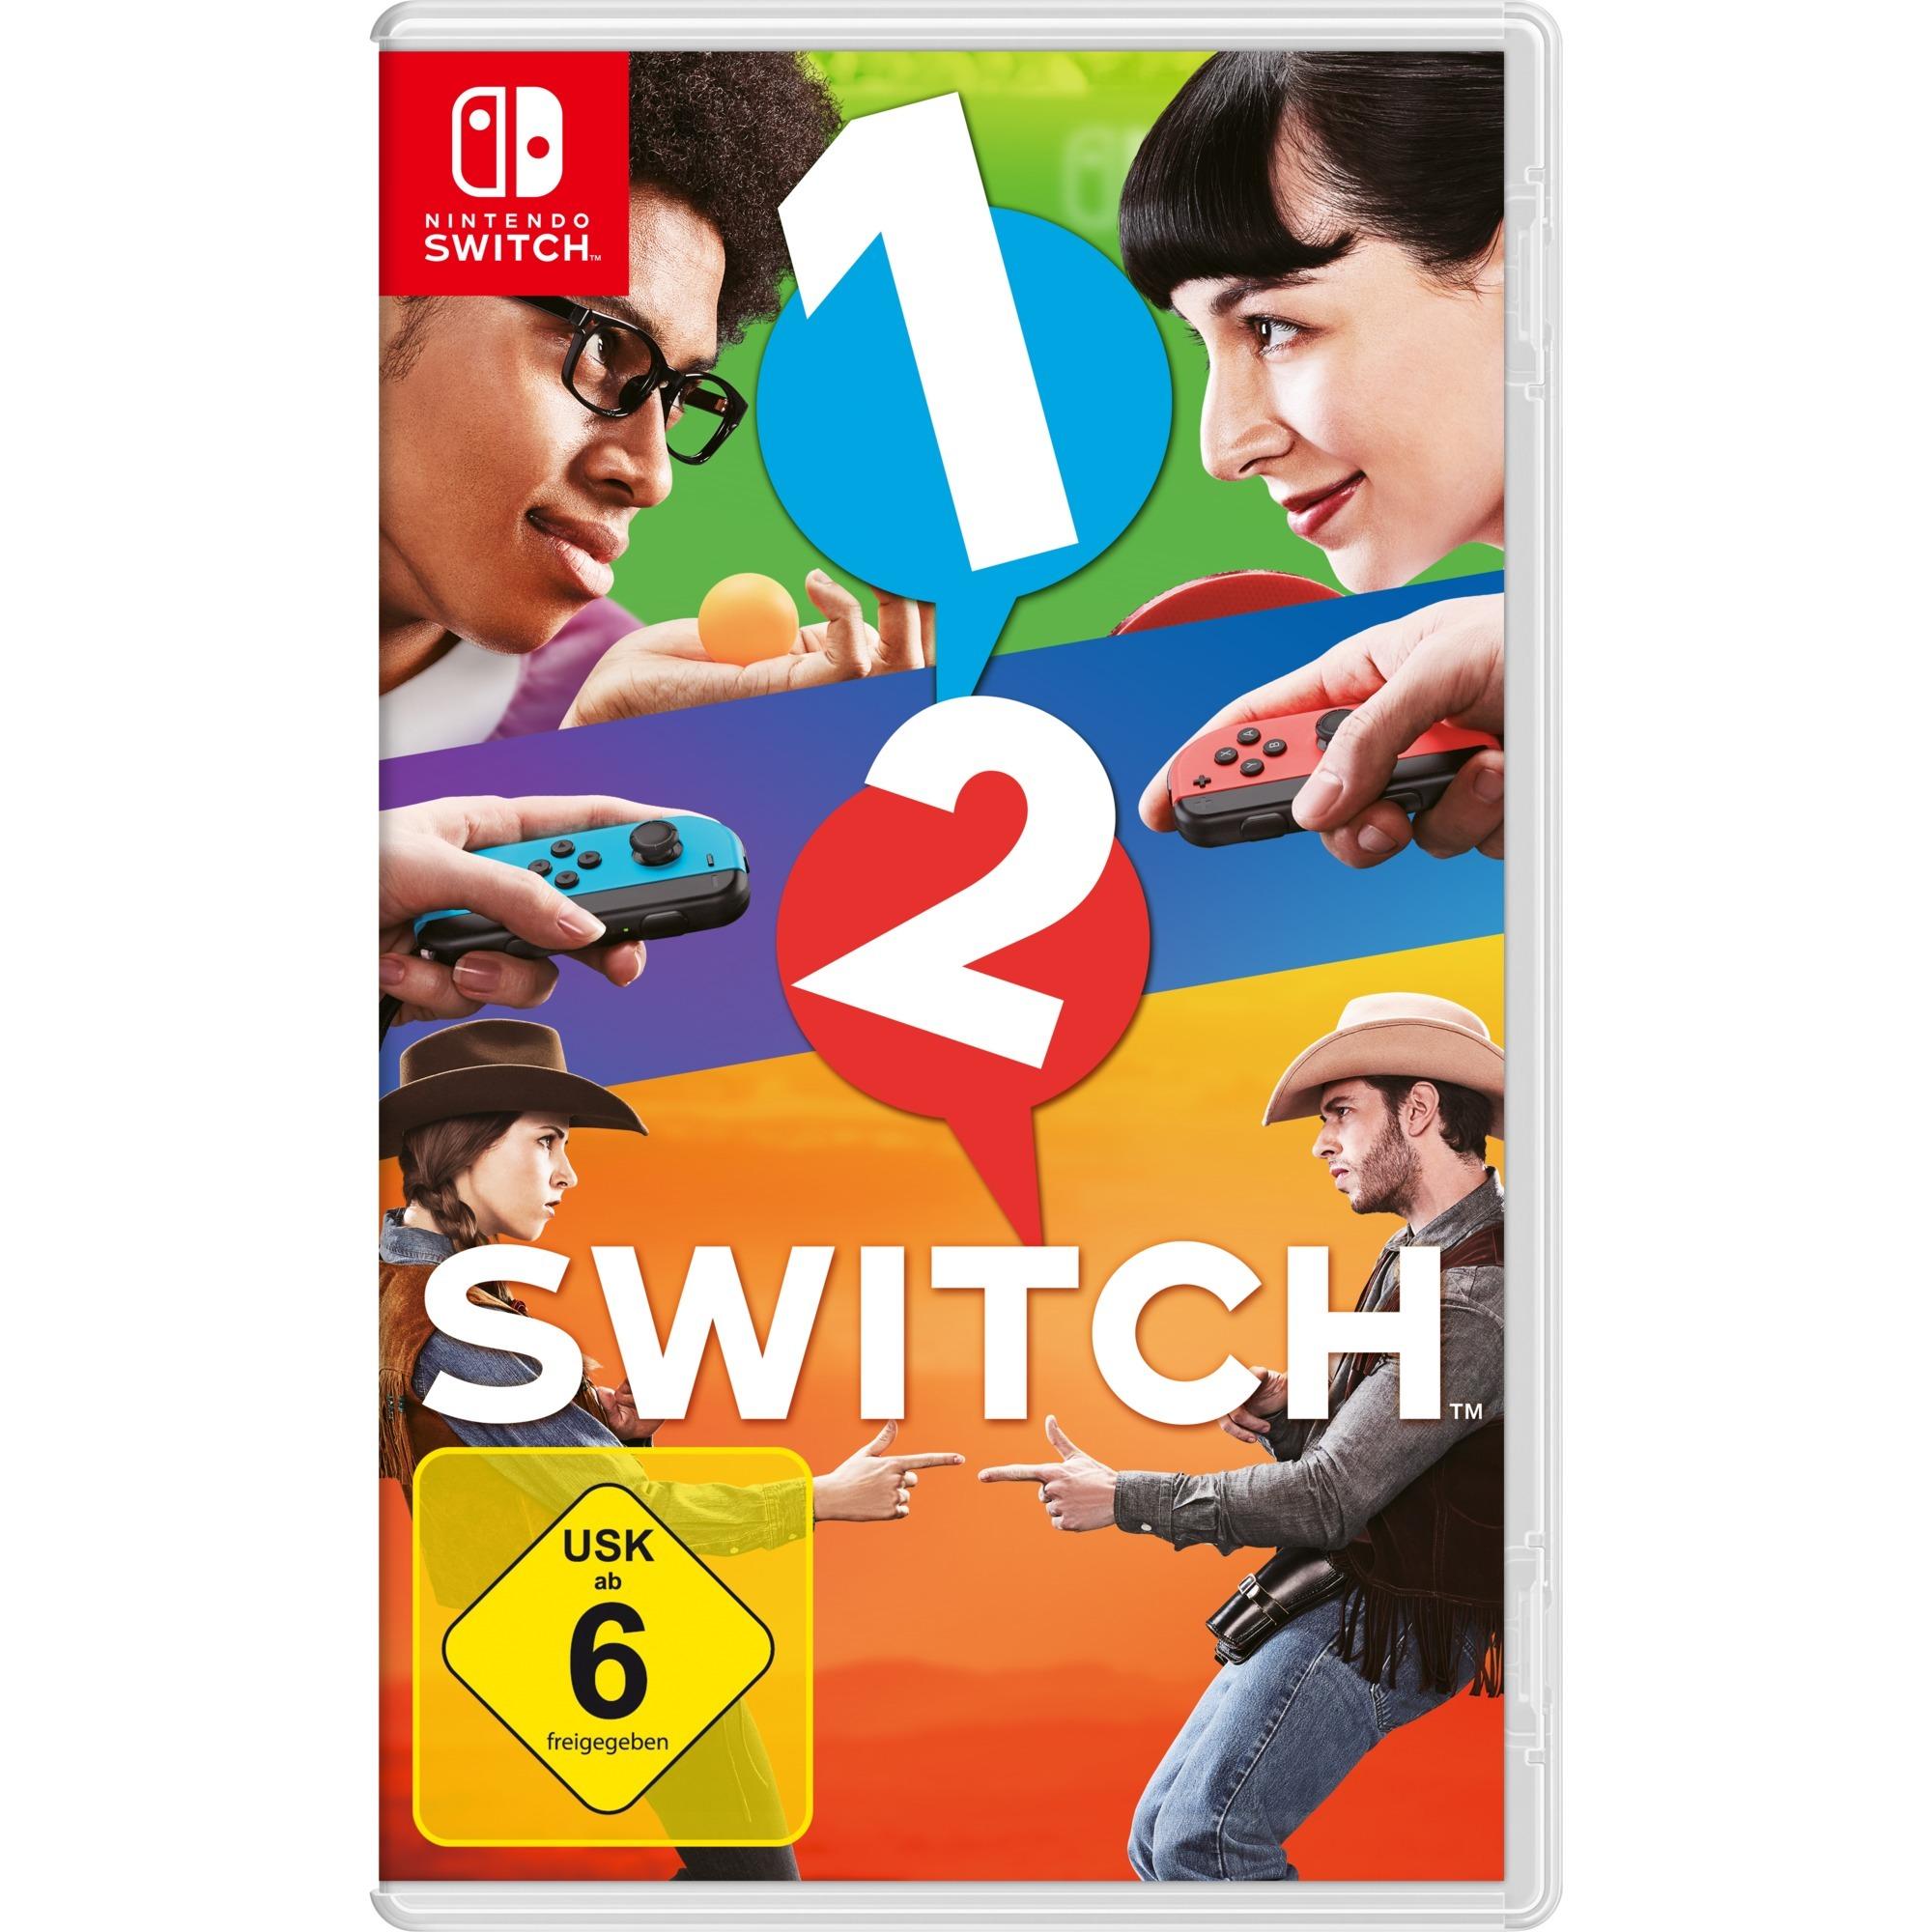 1-2-Switch, Switch vídeo juego Básico Nintendo Switch